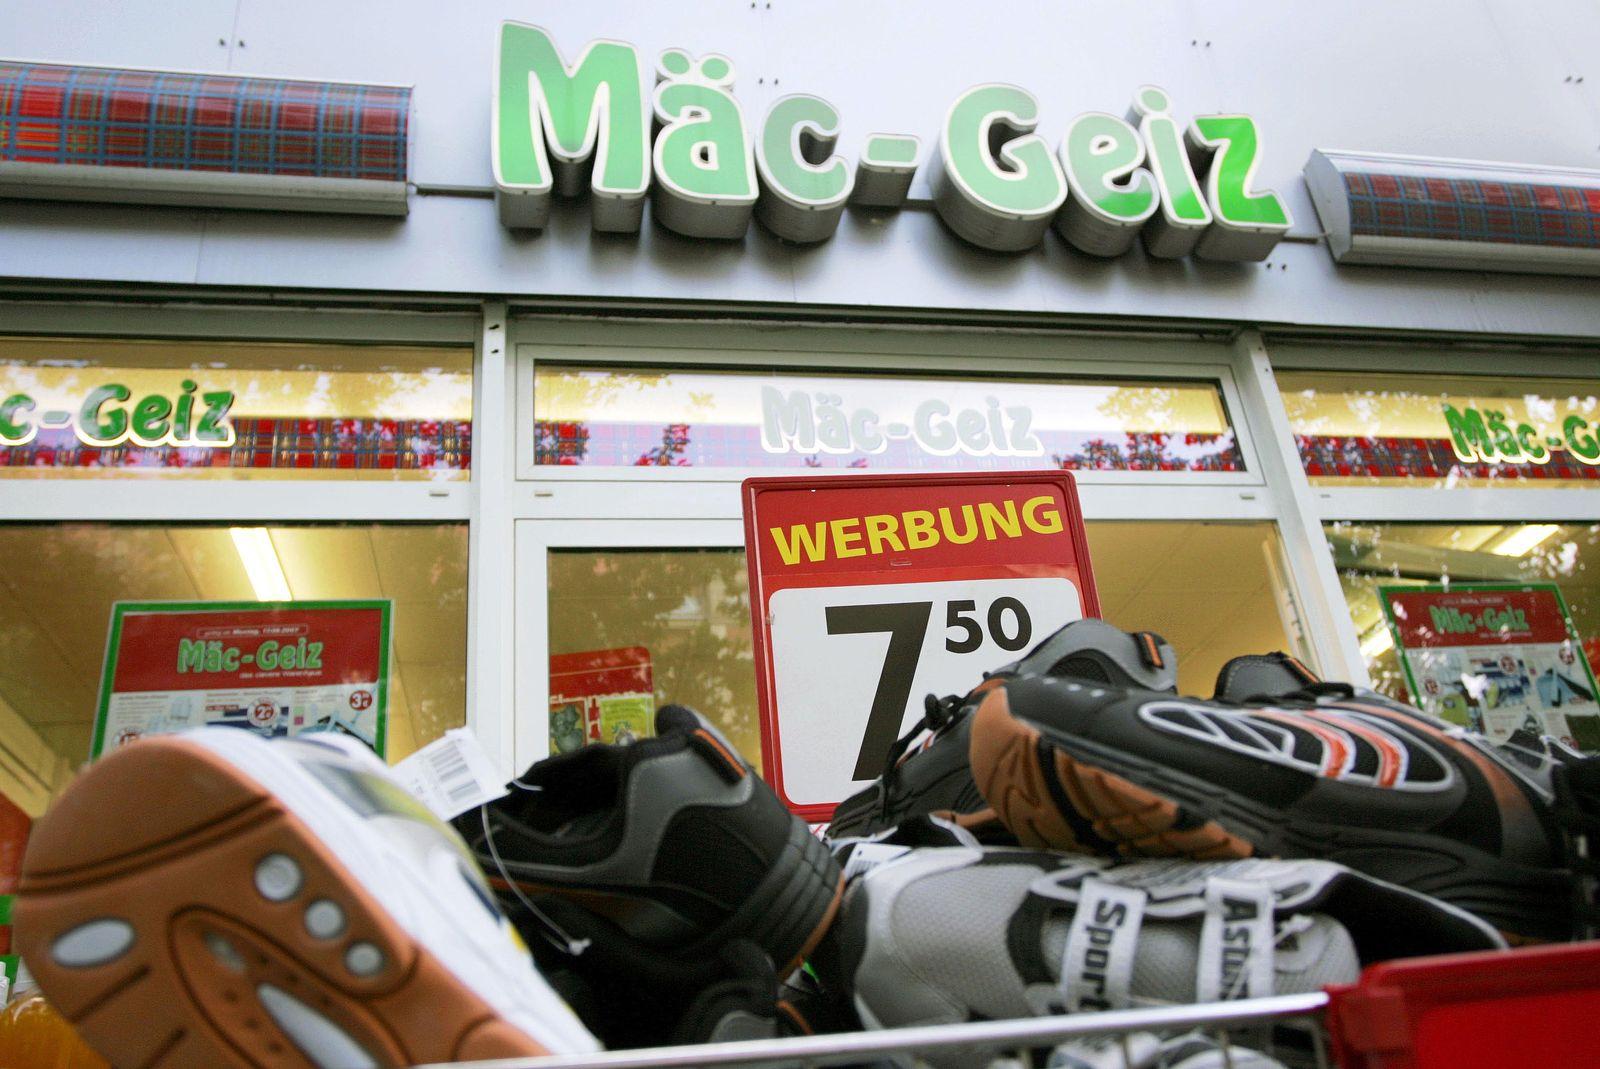 Mäc-Geiz / Mäc Geiz / Billigladen in Berlin